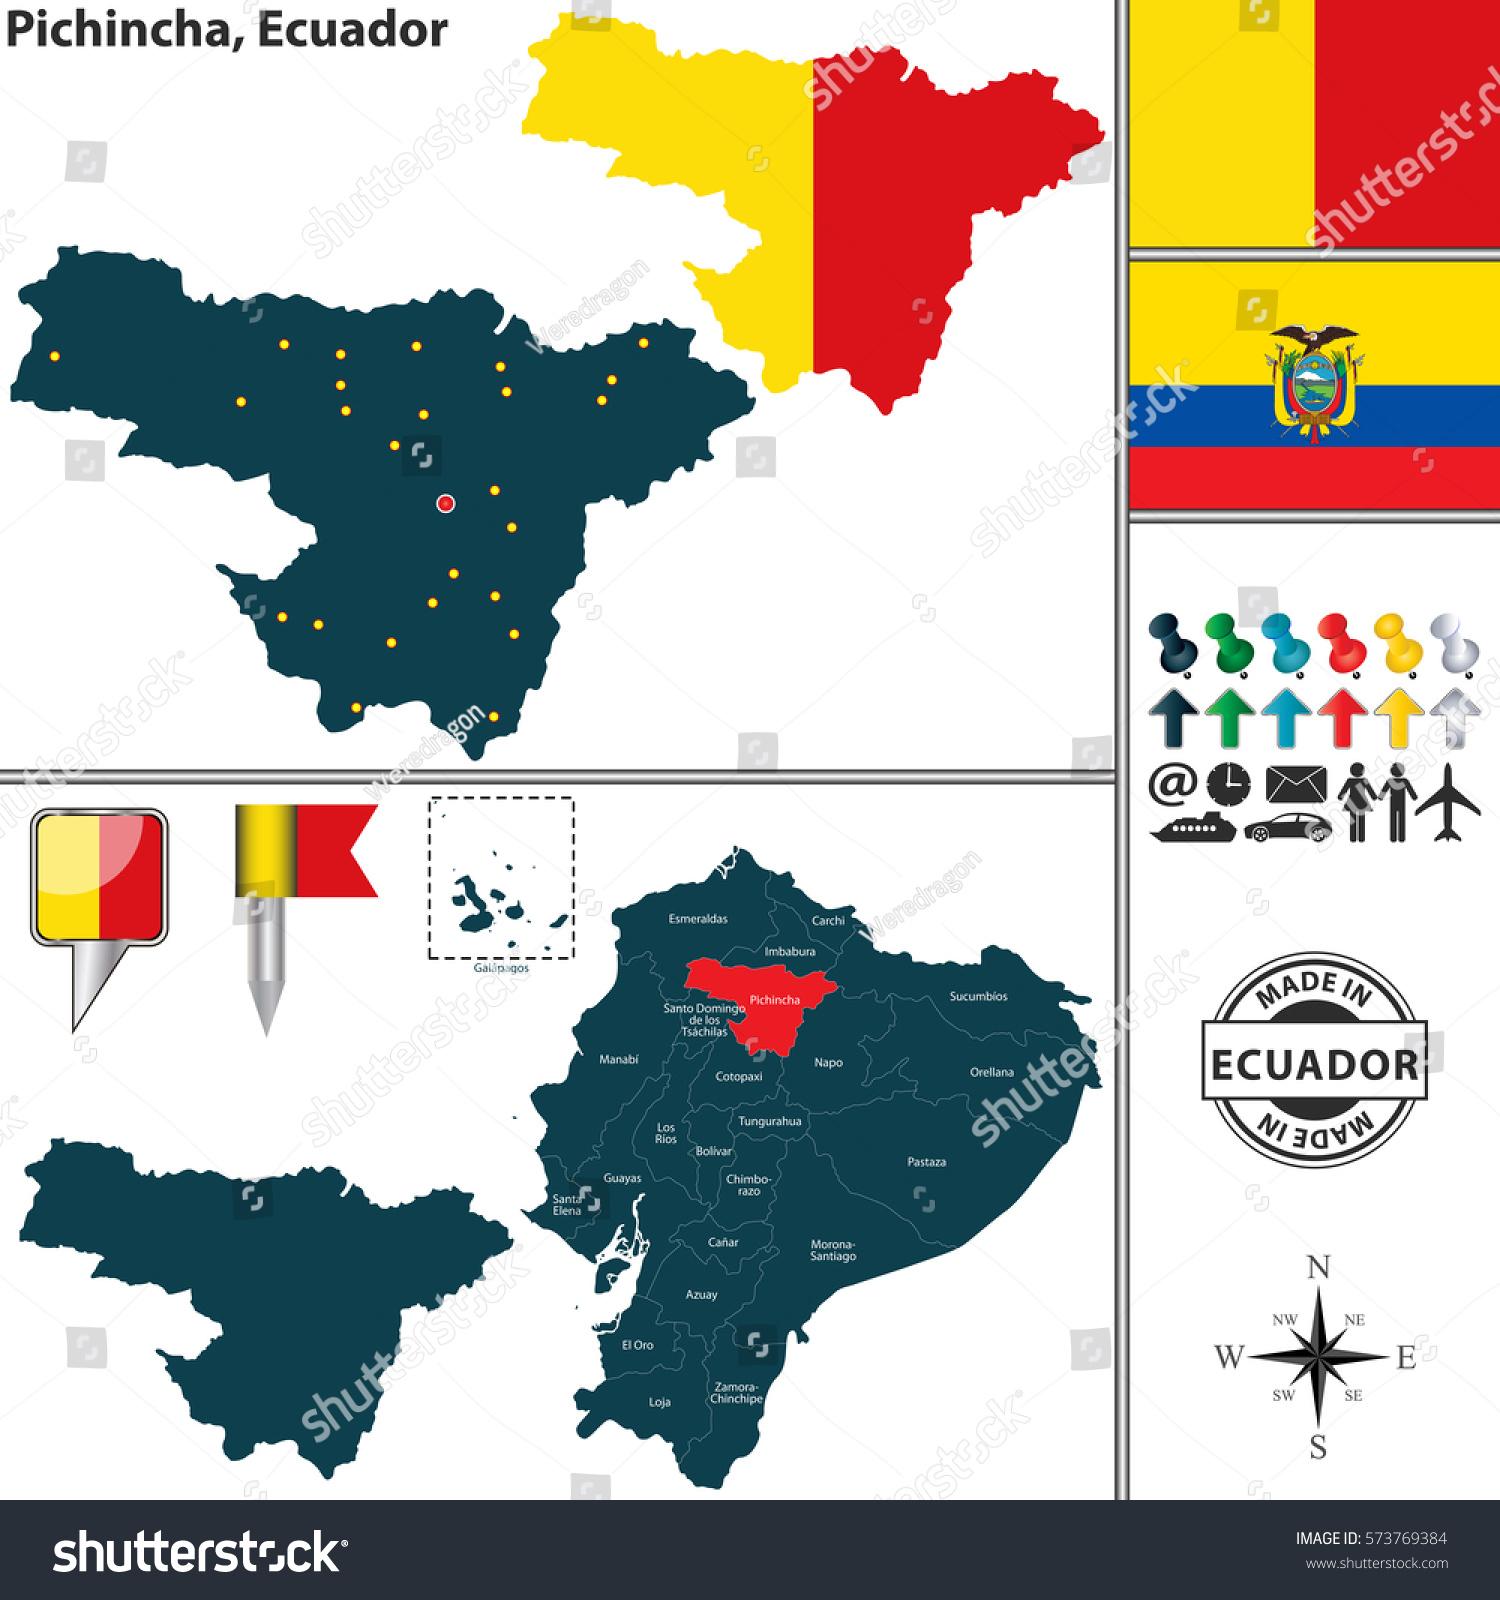 Vector Map Province Pichincha Flags Location Stock Vector - Ecuador provinces map